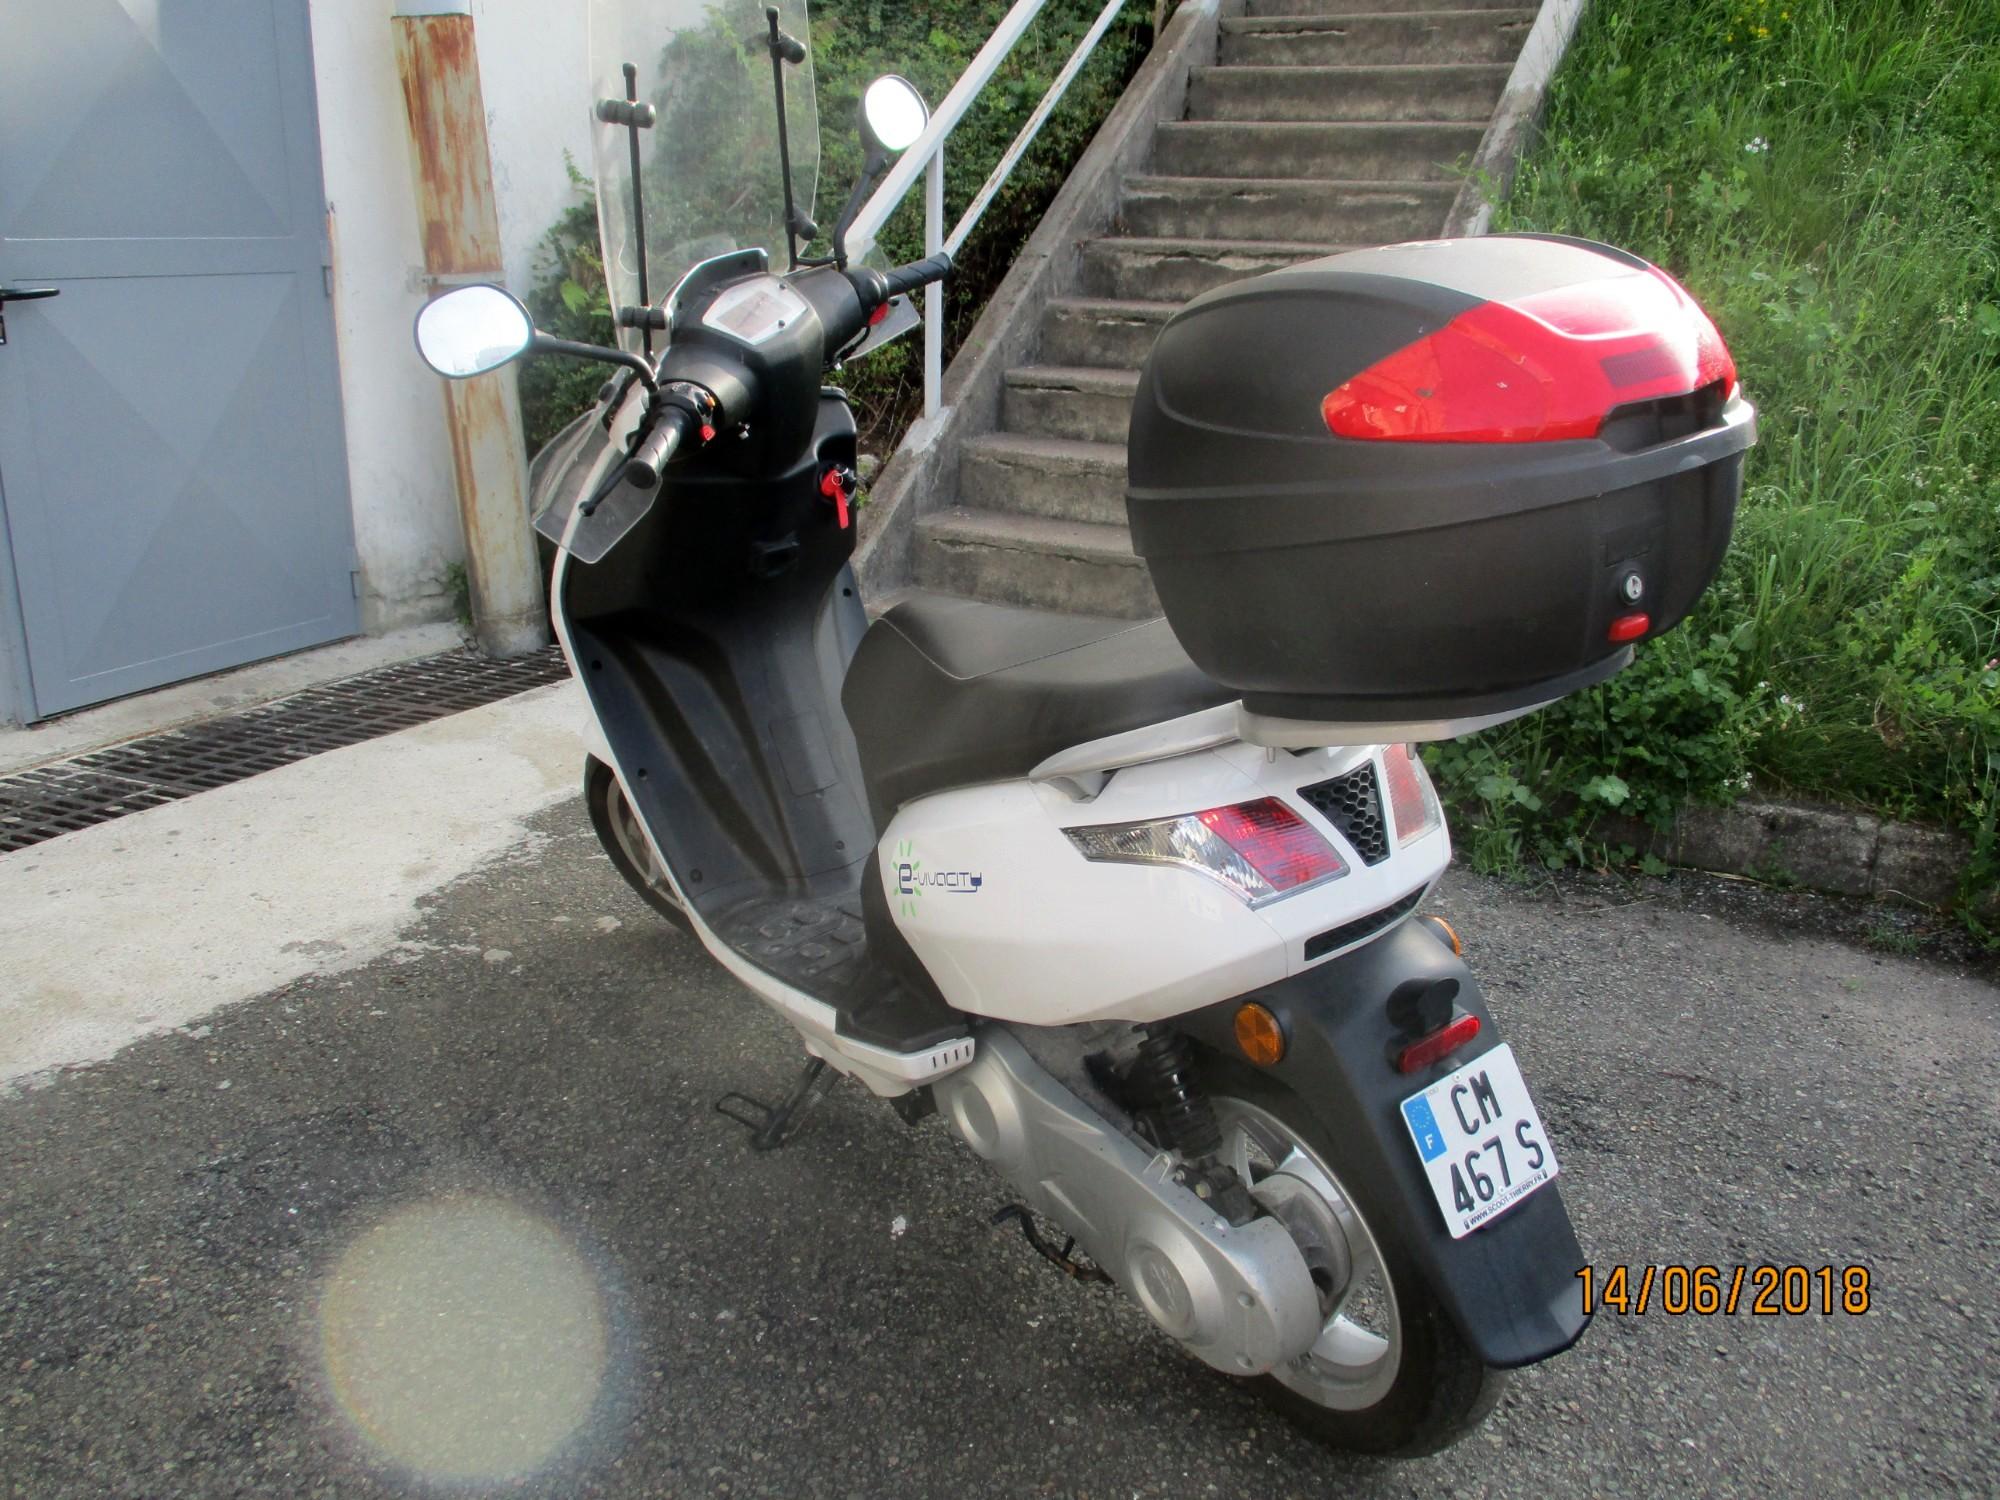 scooter peugeot vivacity electrique 0943 moto scooter 2 roues d 39 occasion aux ench res. Black Bedroom Furniture Sets. Home Design Ideas